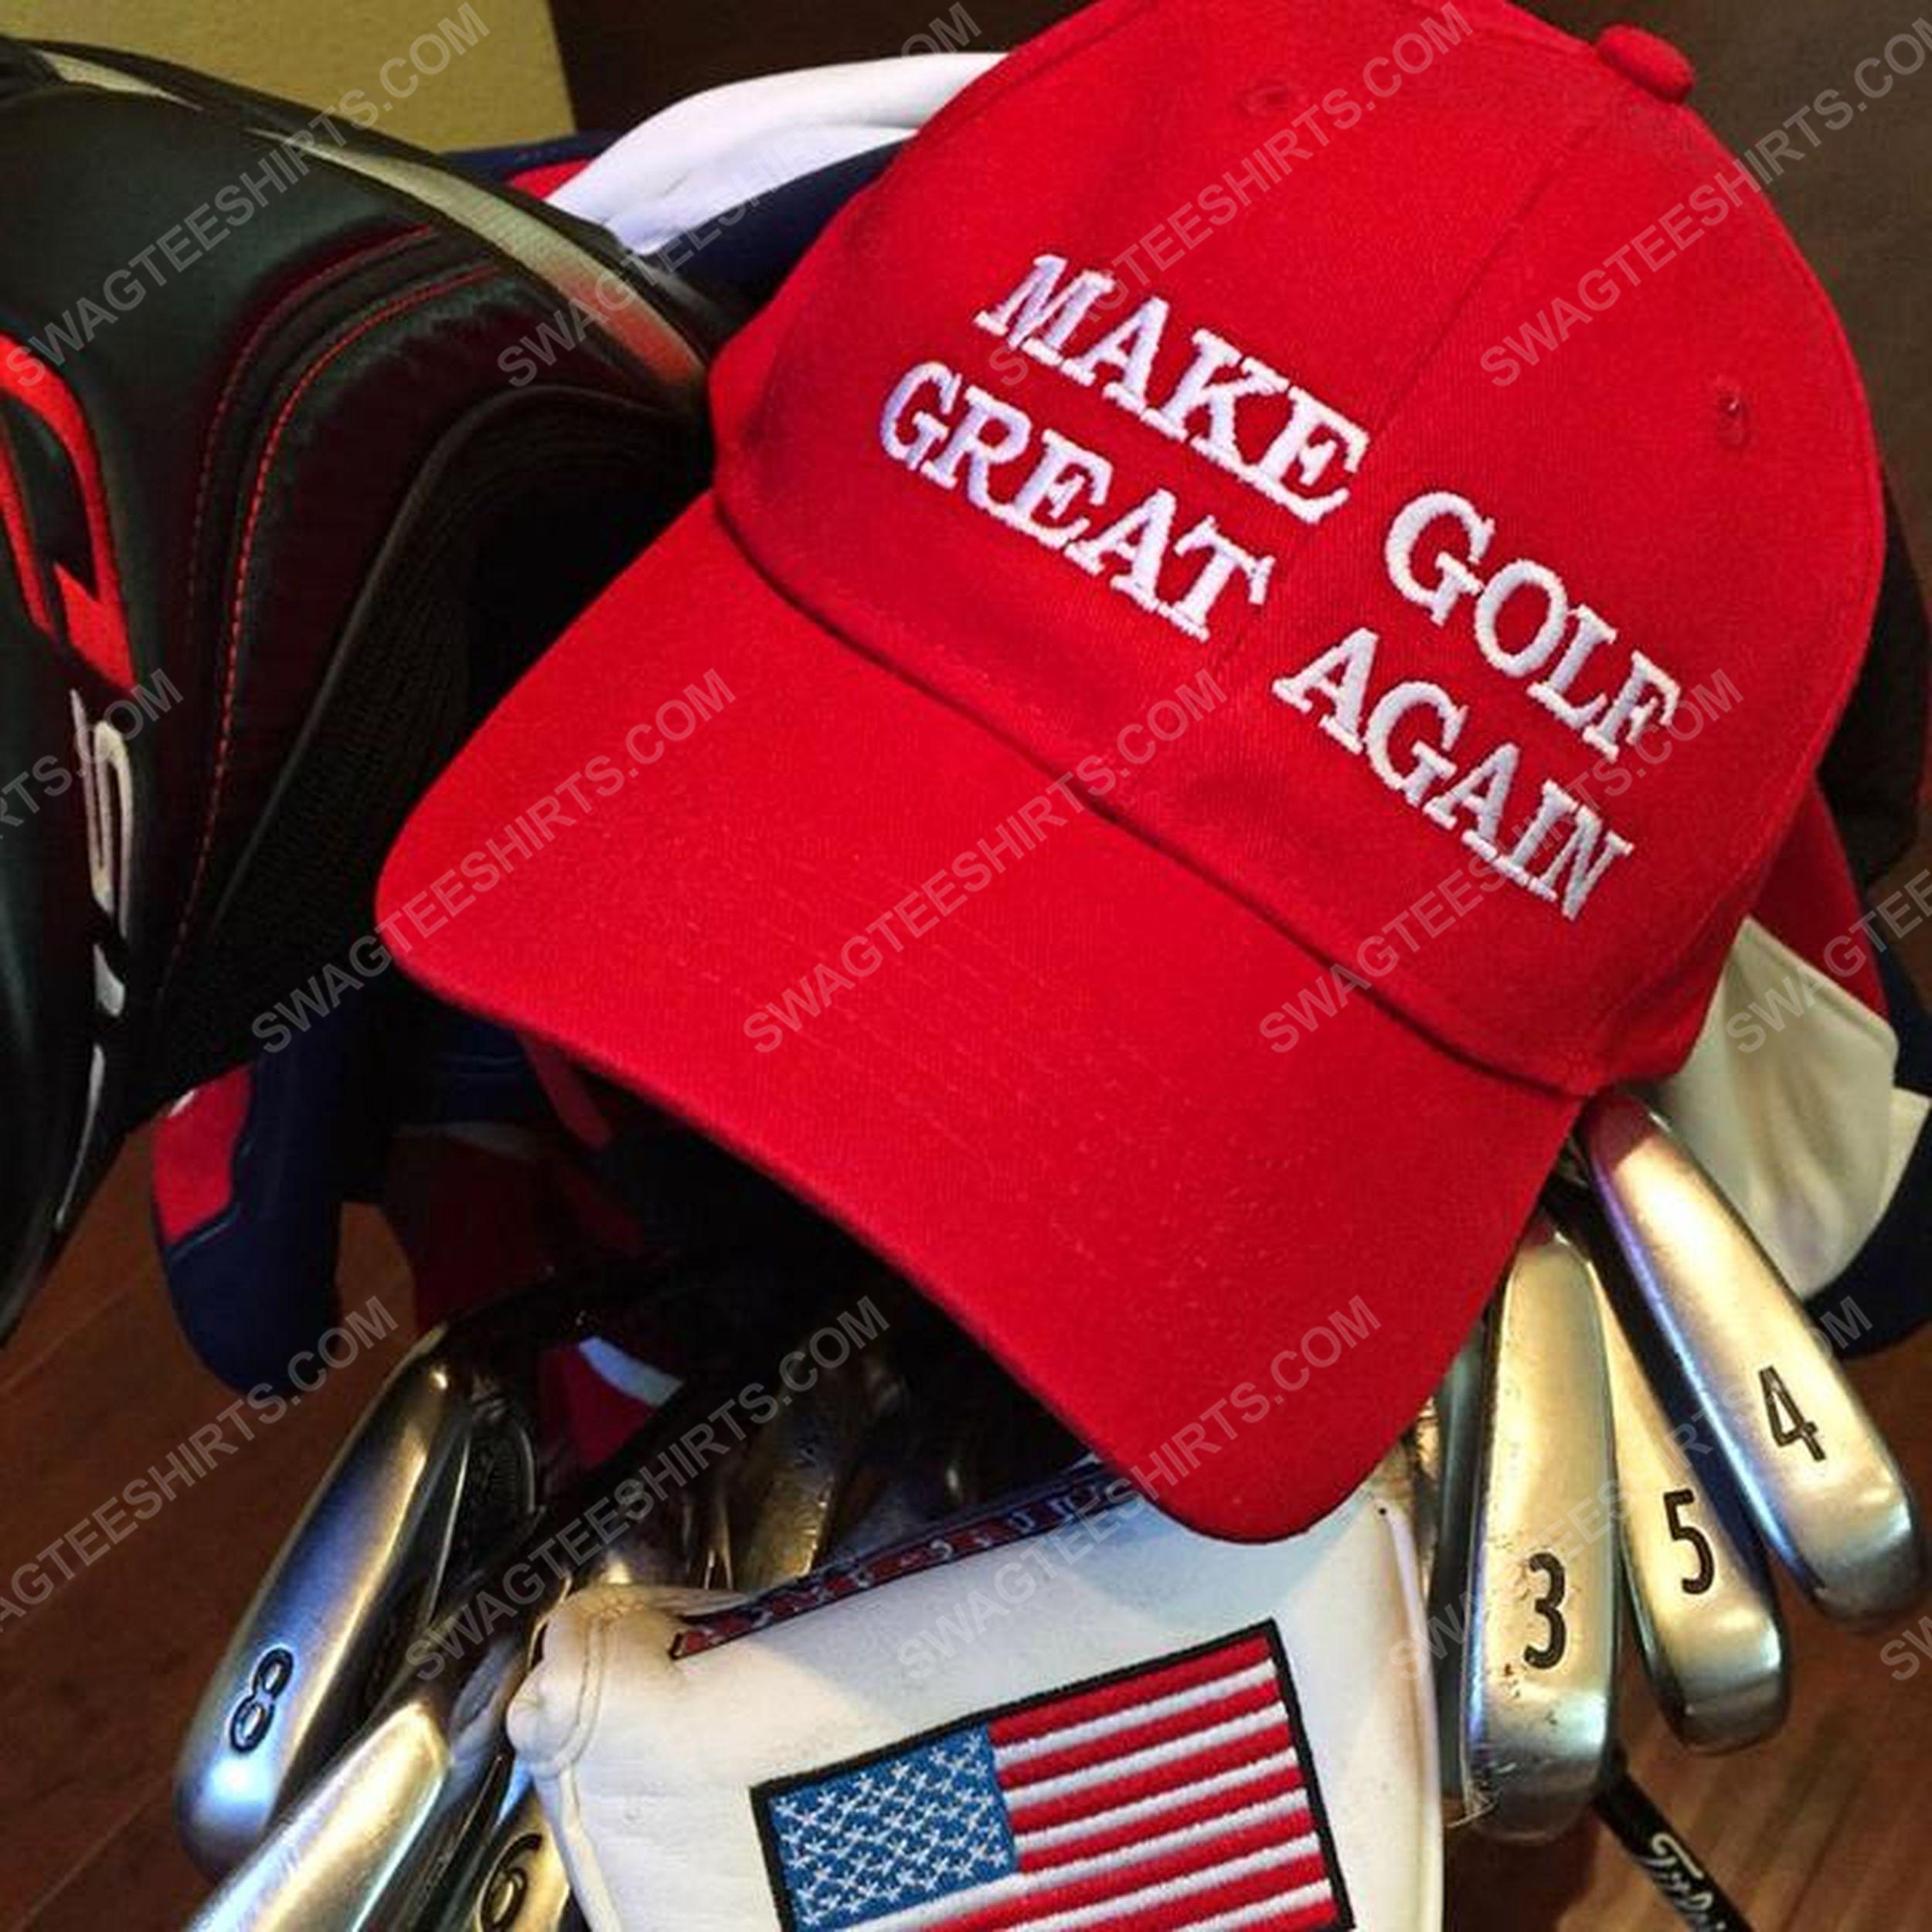 Make golf great again full print classic hat 1